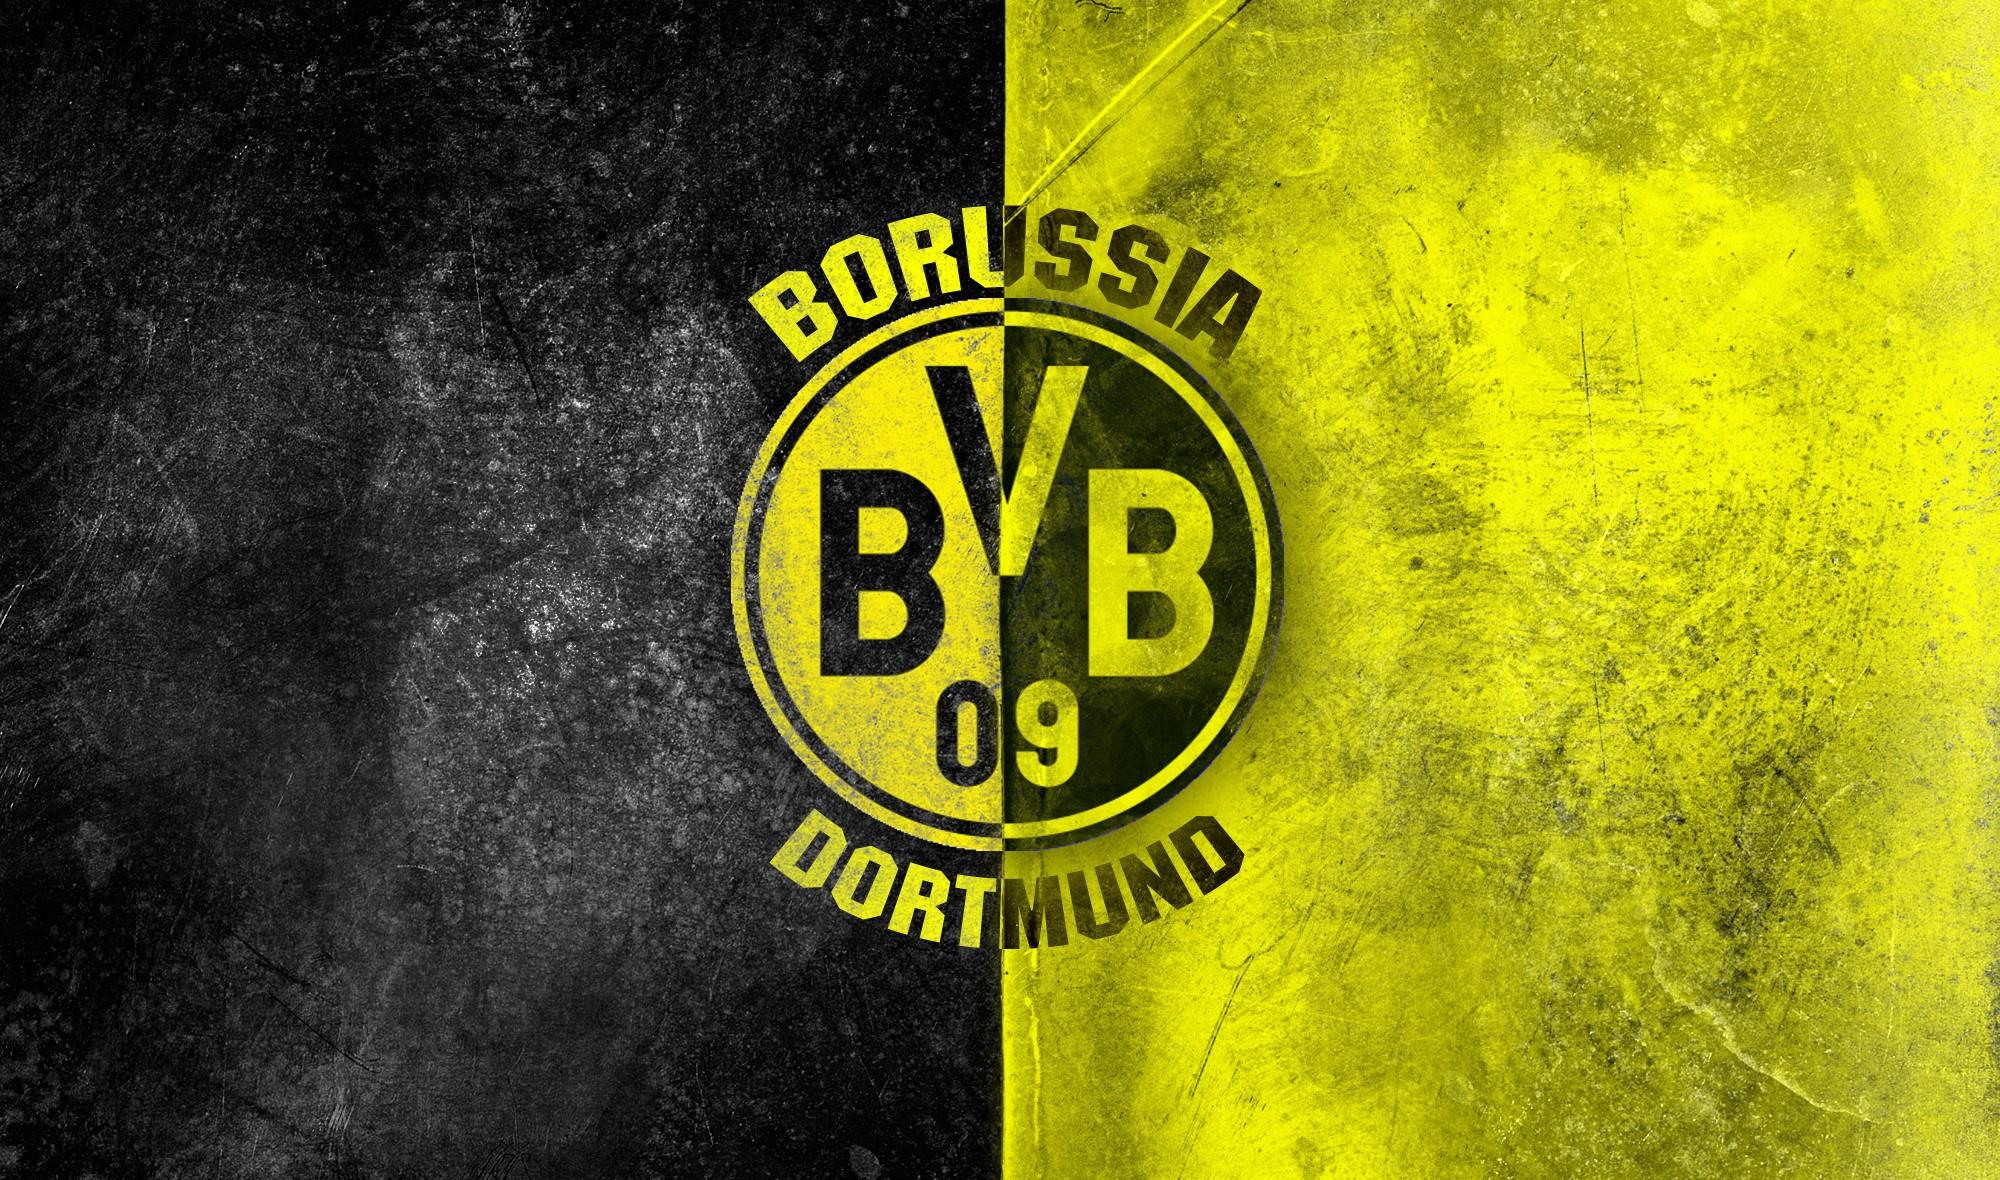 Borussia Dortmund HQ Background Wallpapers 32222   Baltana 2000x1180